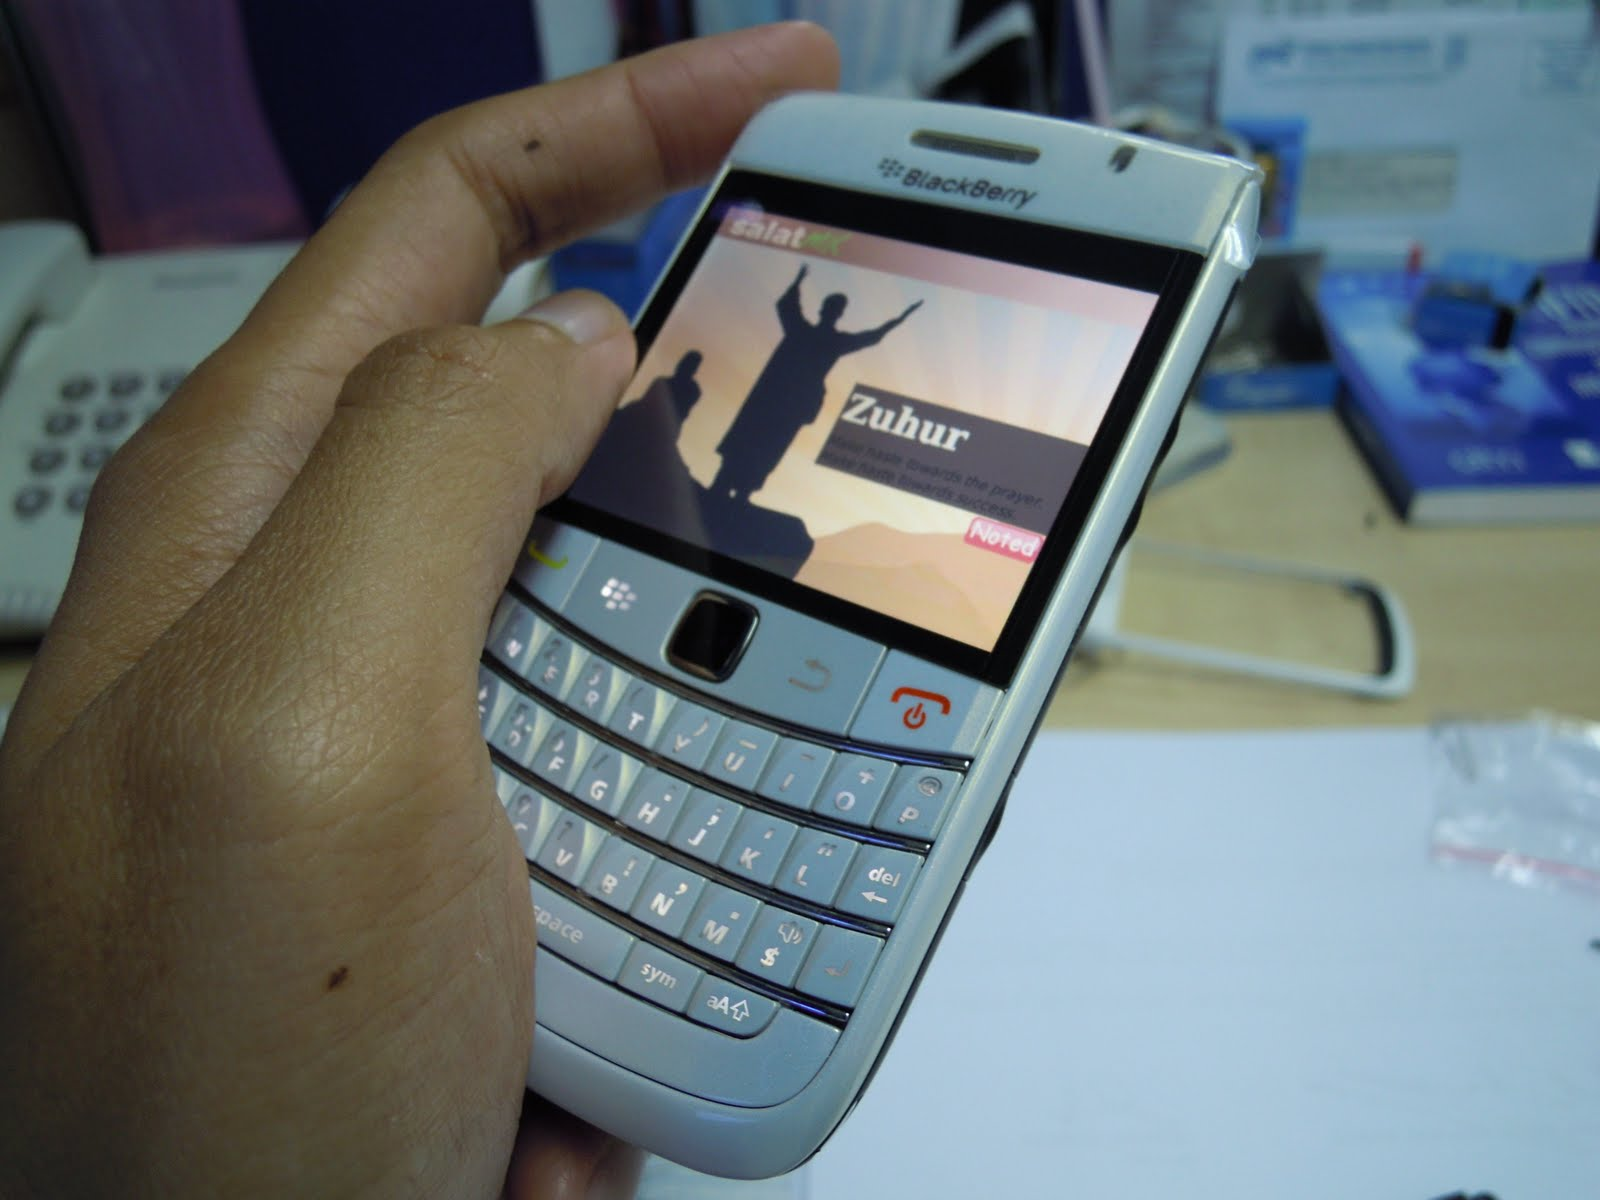 YuJiTo Accessories: Blackberry Bold 9700 Housing